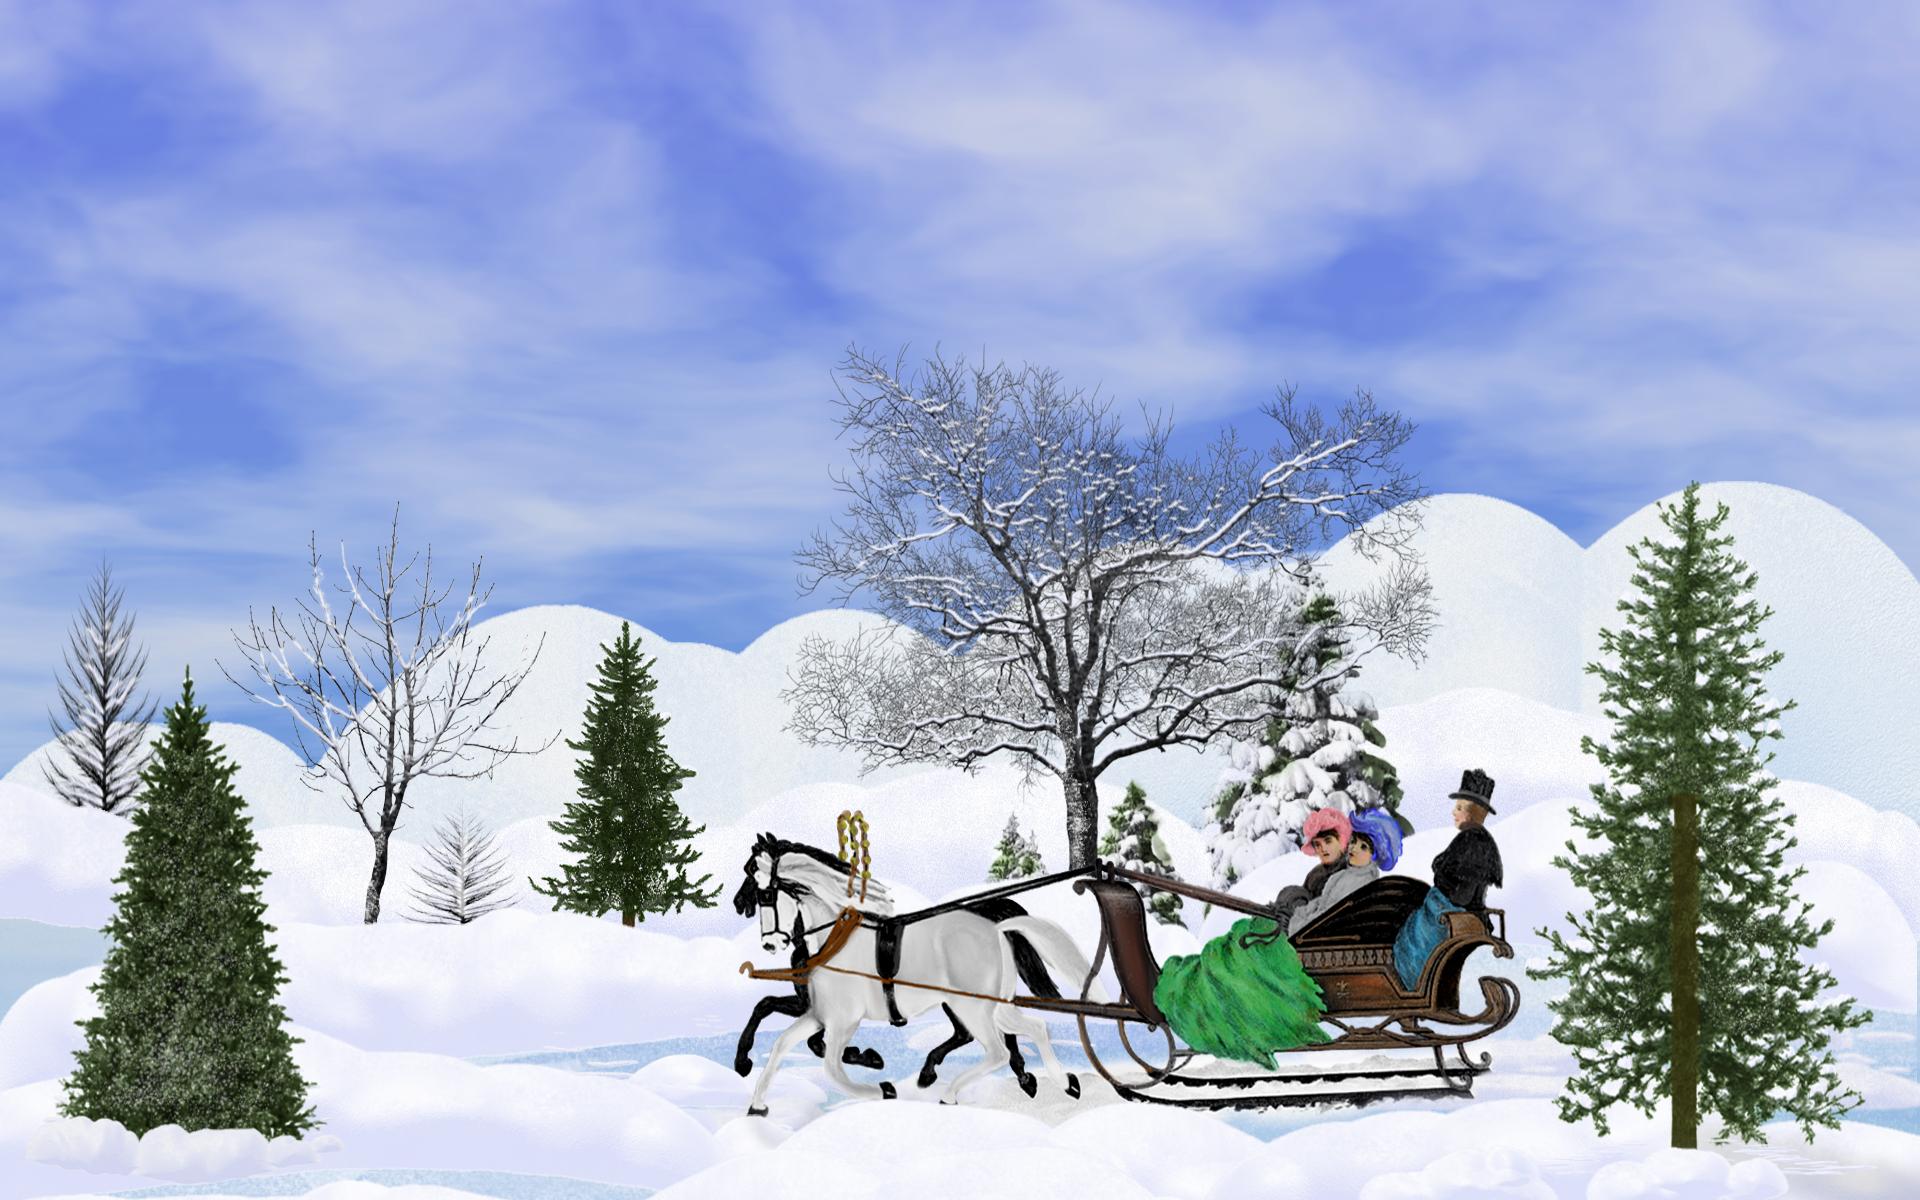 ChristmasSleighRide1920x1200.jpg